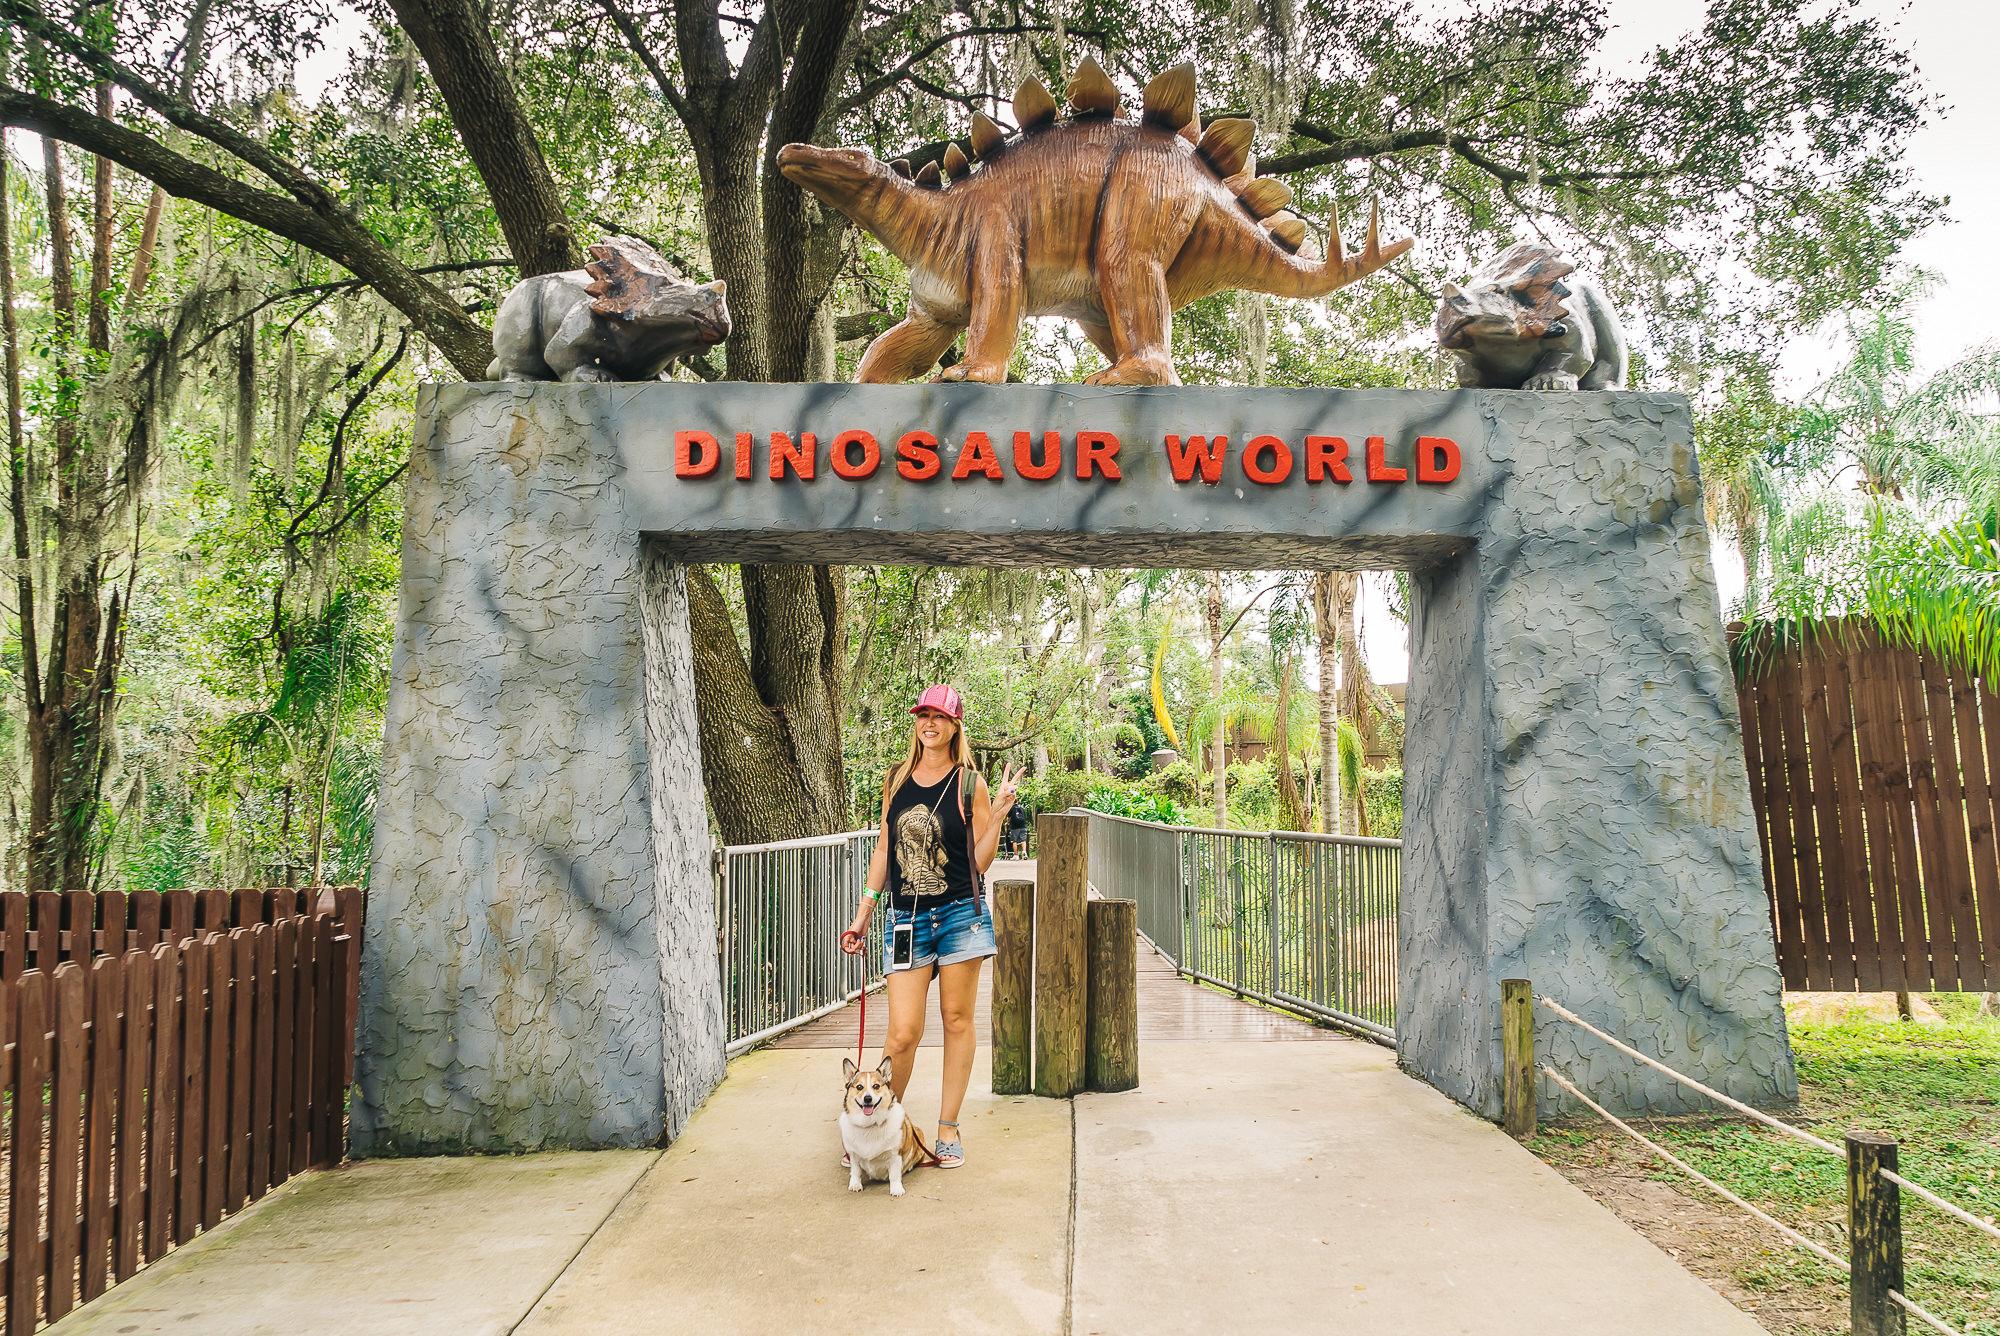 Pet-friendly Dinosaur World in Plant City, Florida